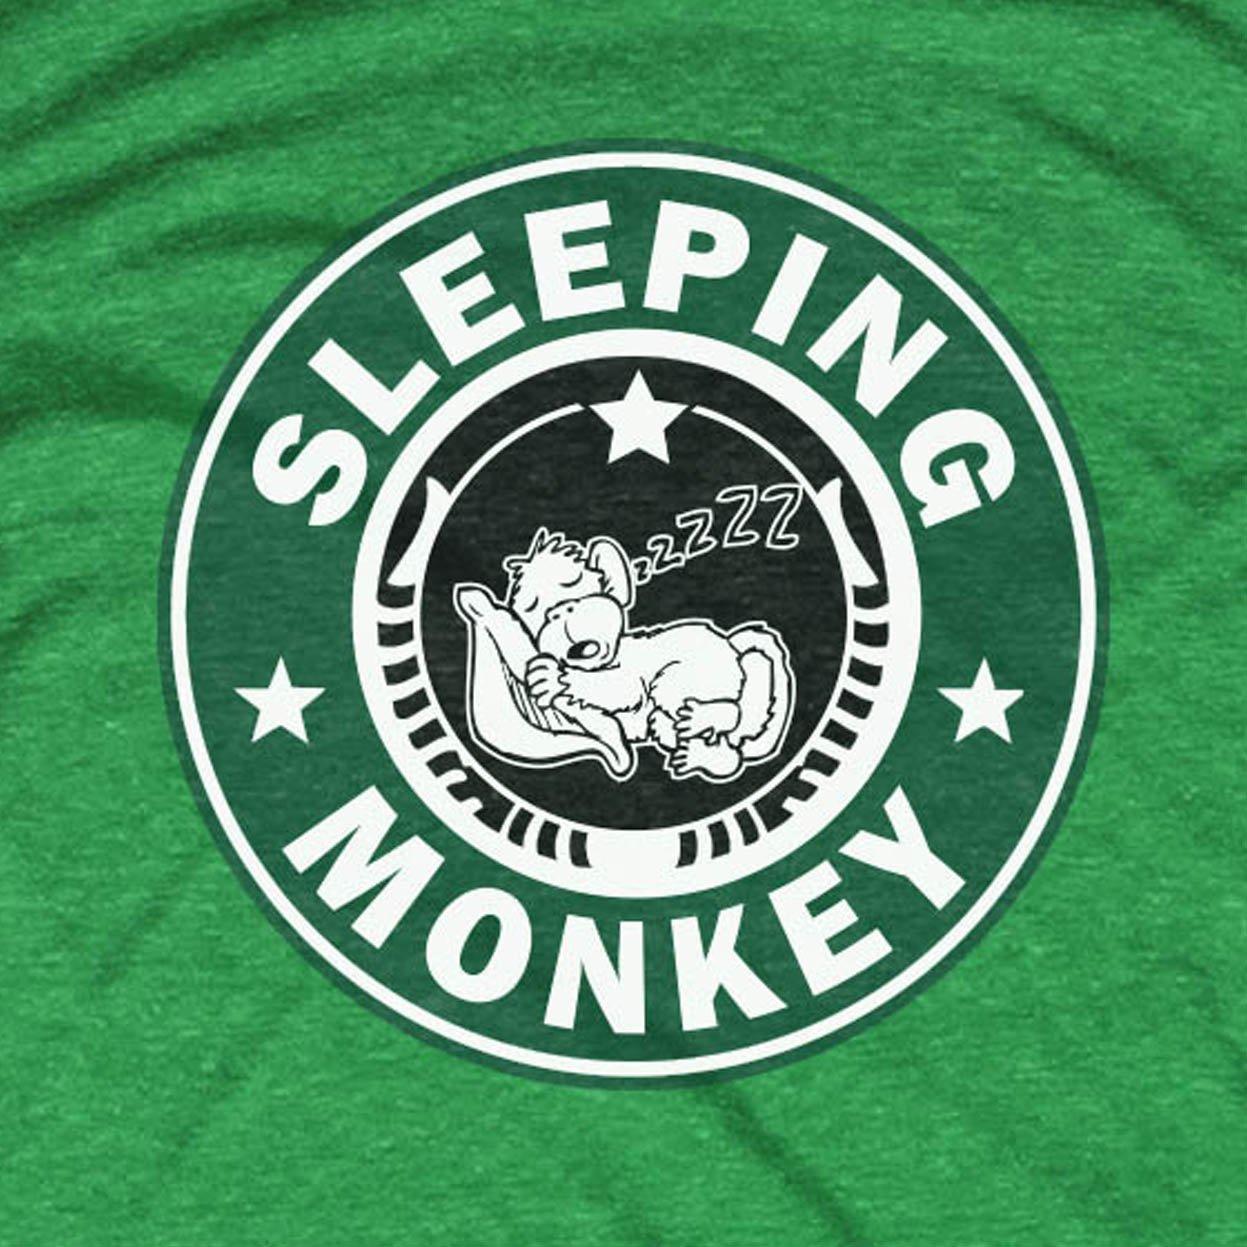 Phish Sleeping Monkey T-shirt